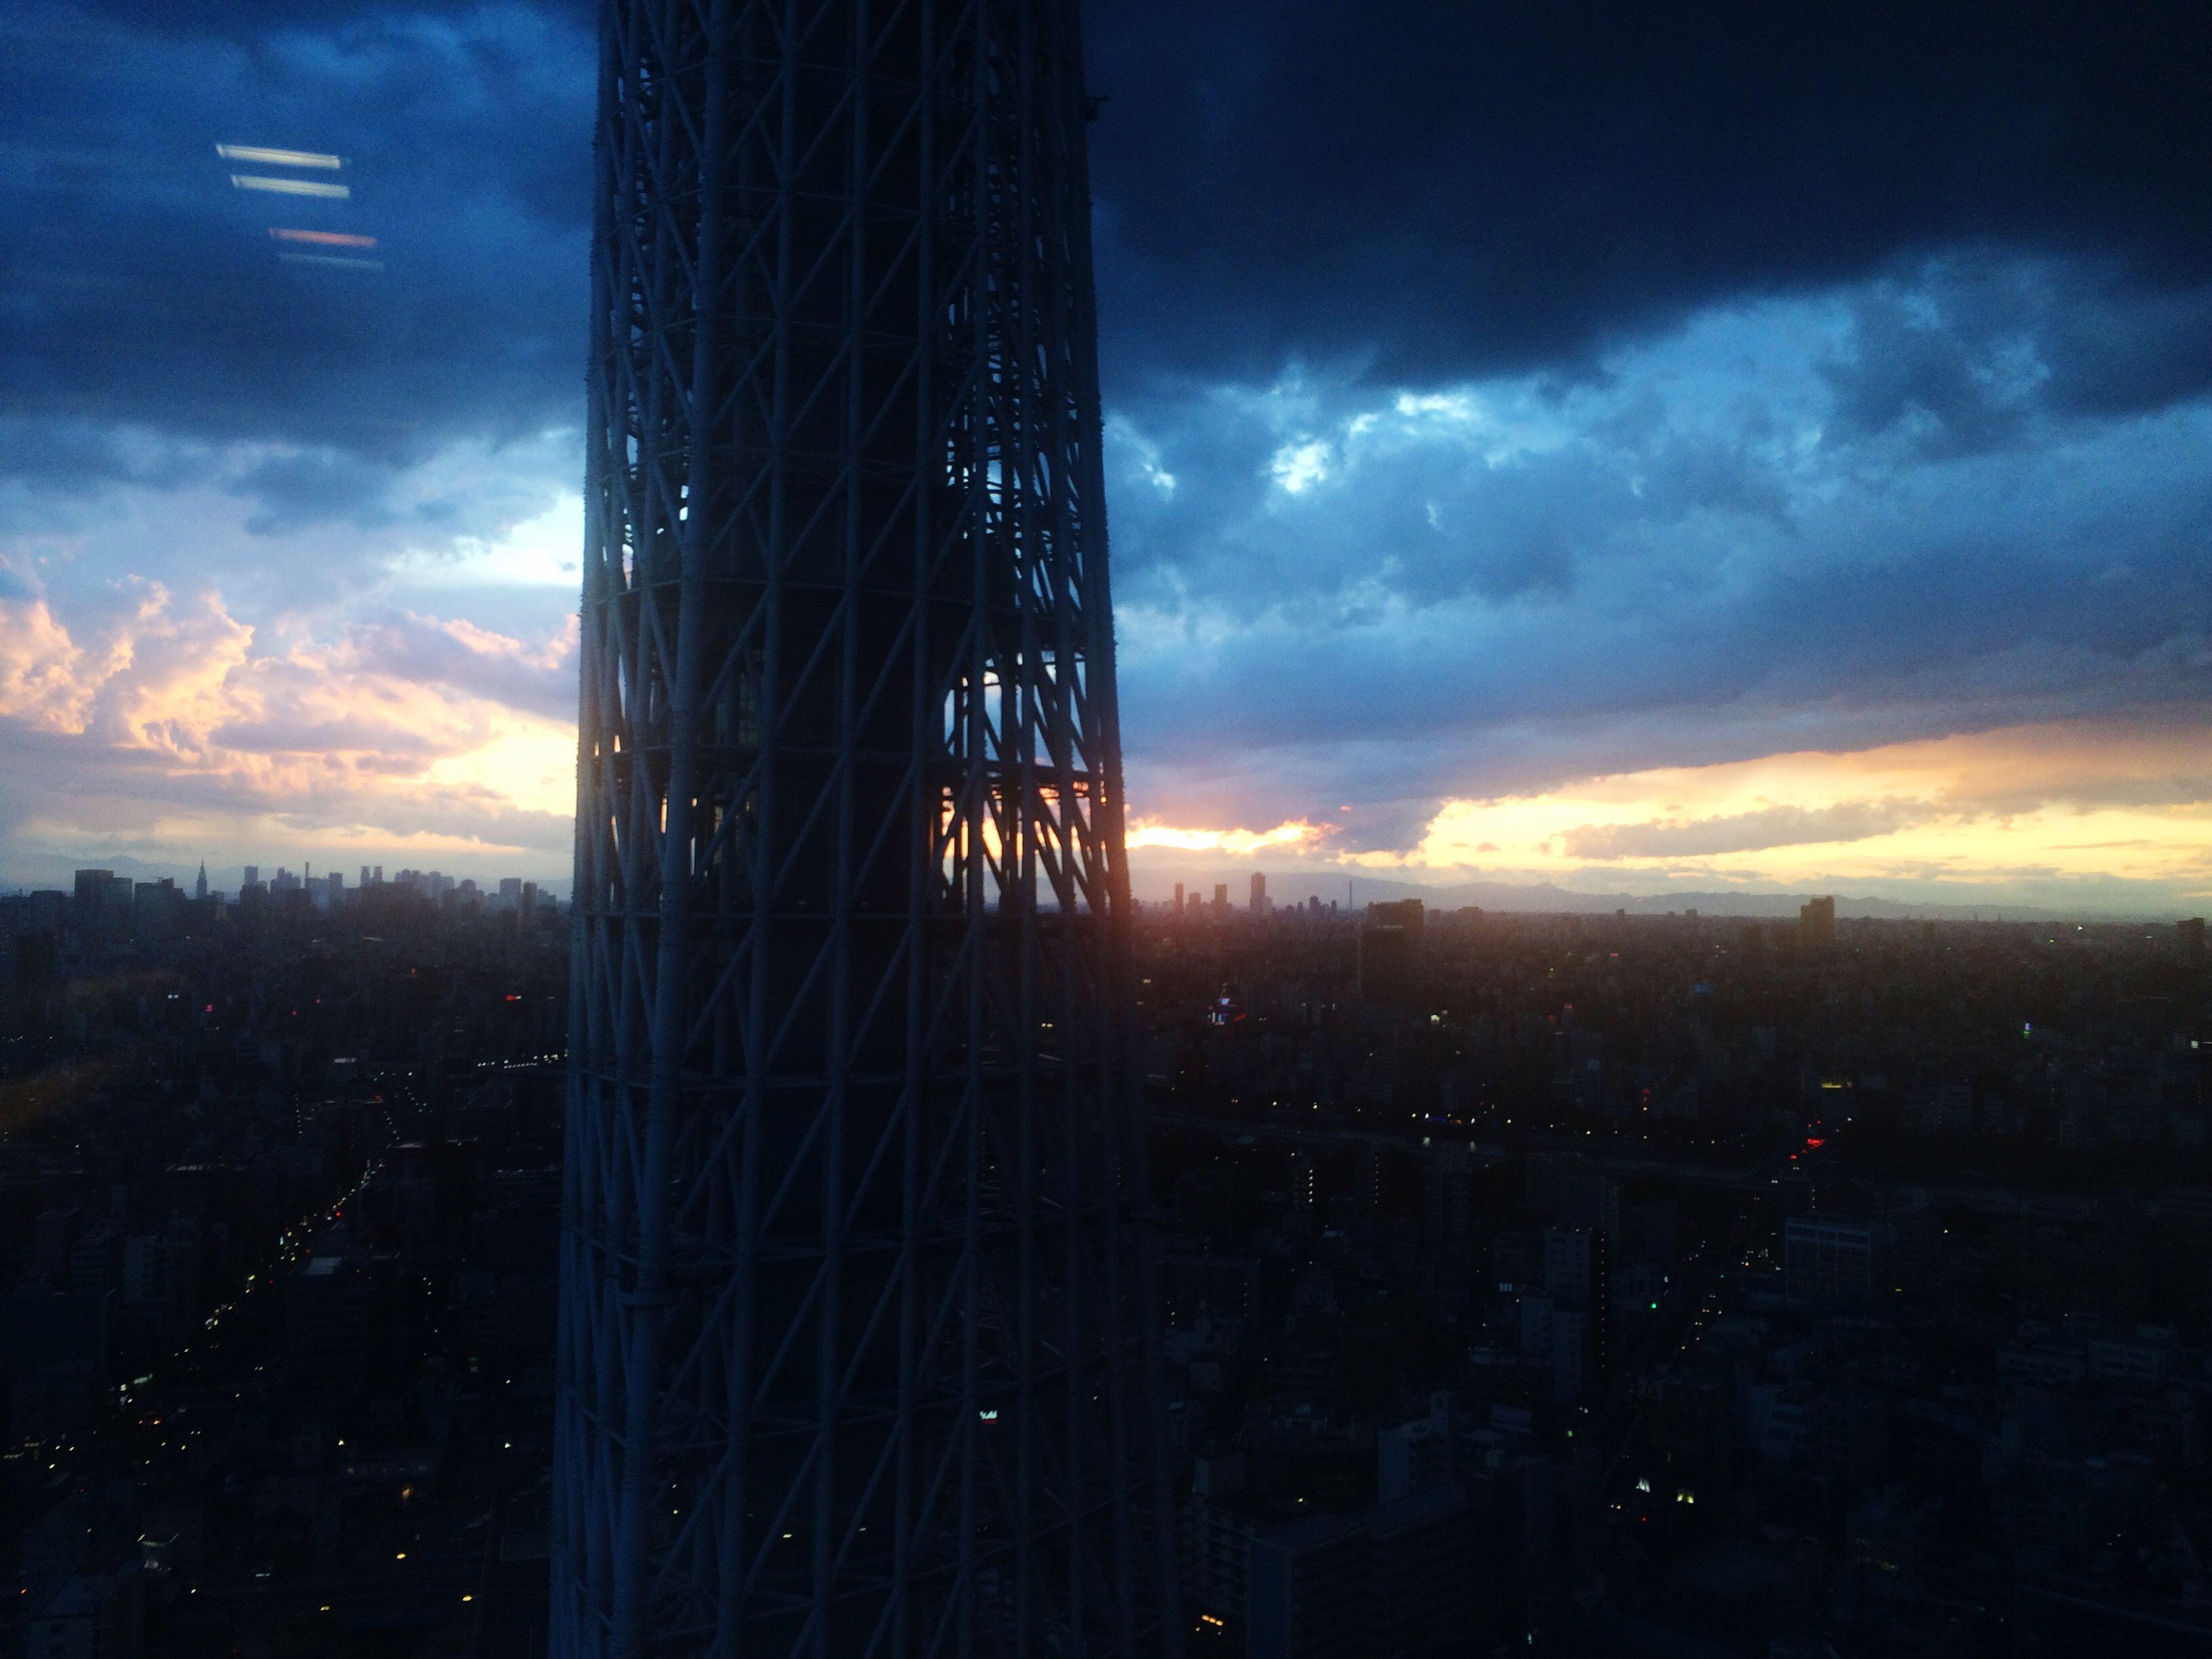 sunset, sky, architecture, building exterior, built structure, cloud - sky, city, cityscape, silhouette, cloud, dusk, orange color, cloudy, landscape, skyscraper, dramatic sky, no people, modern, tower, outdoors